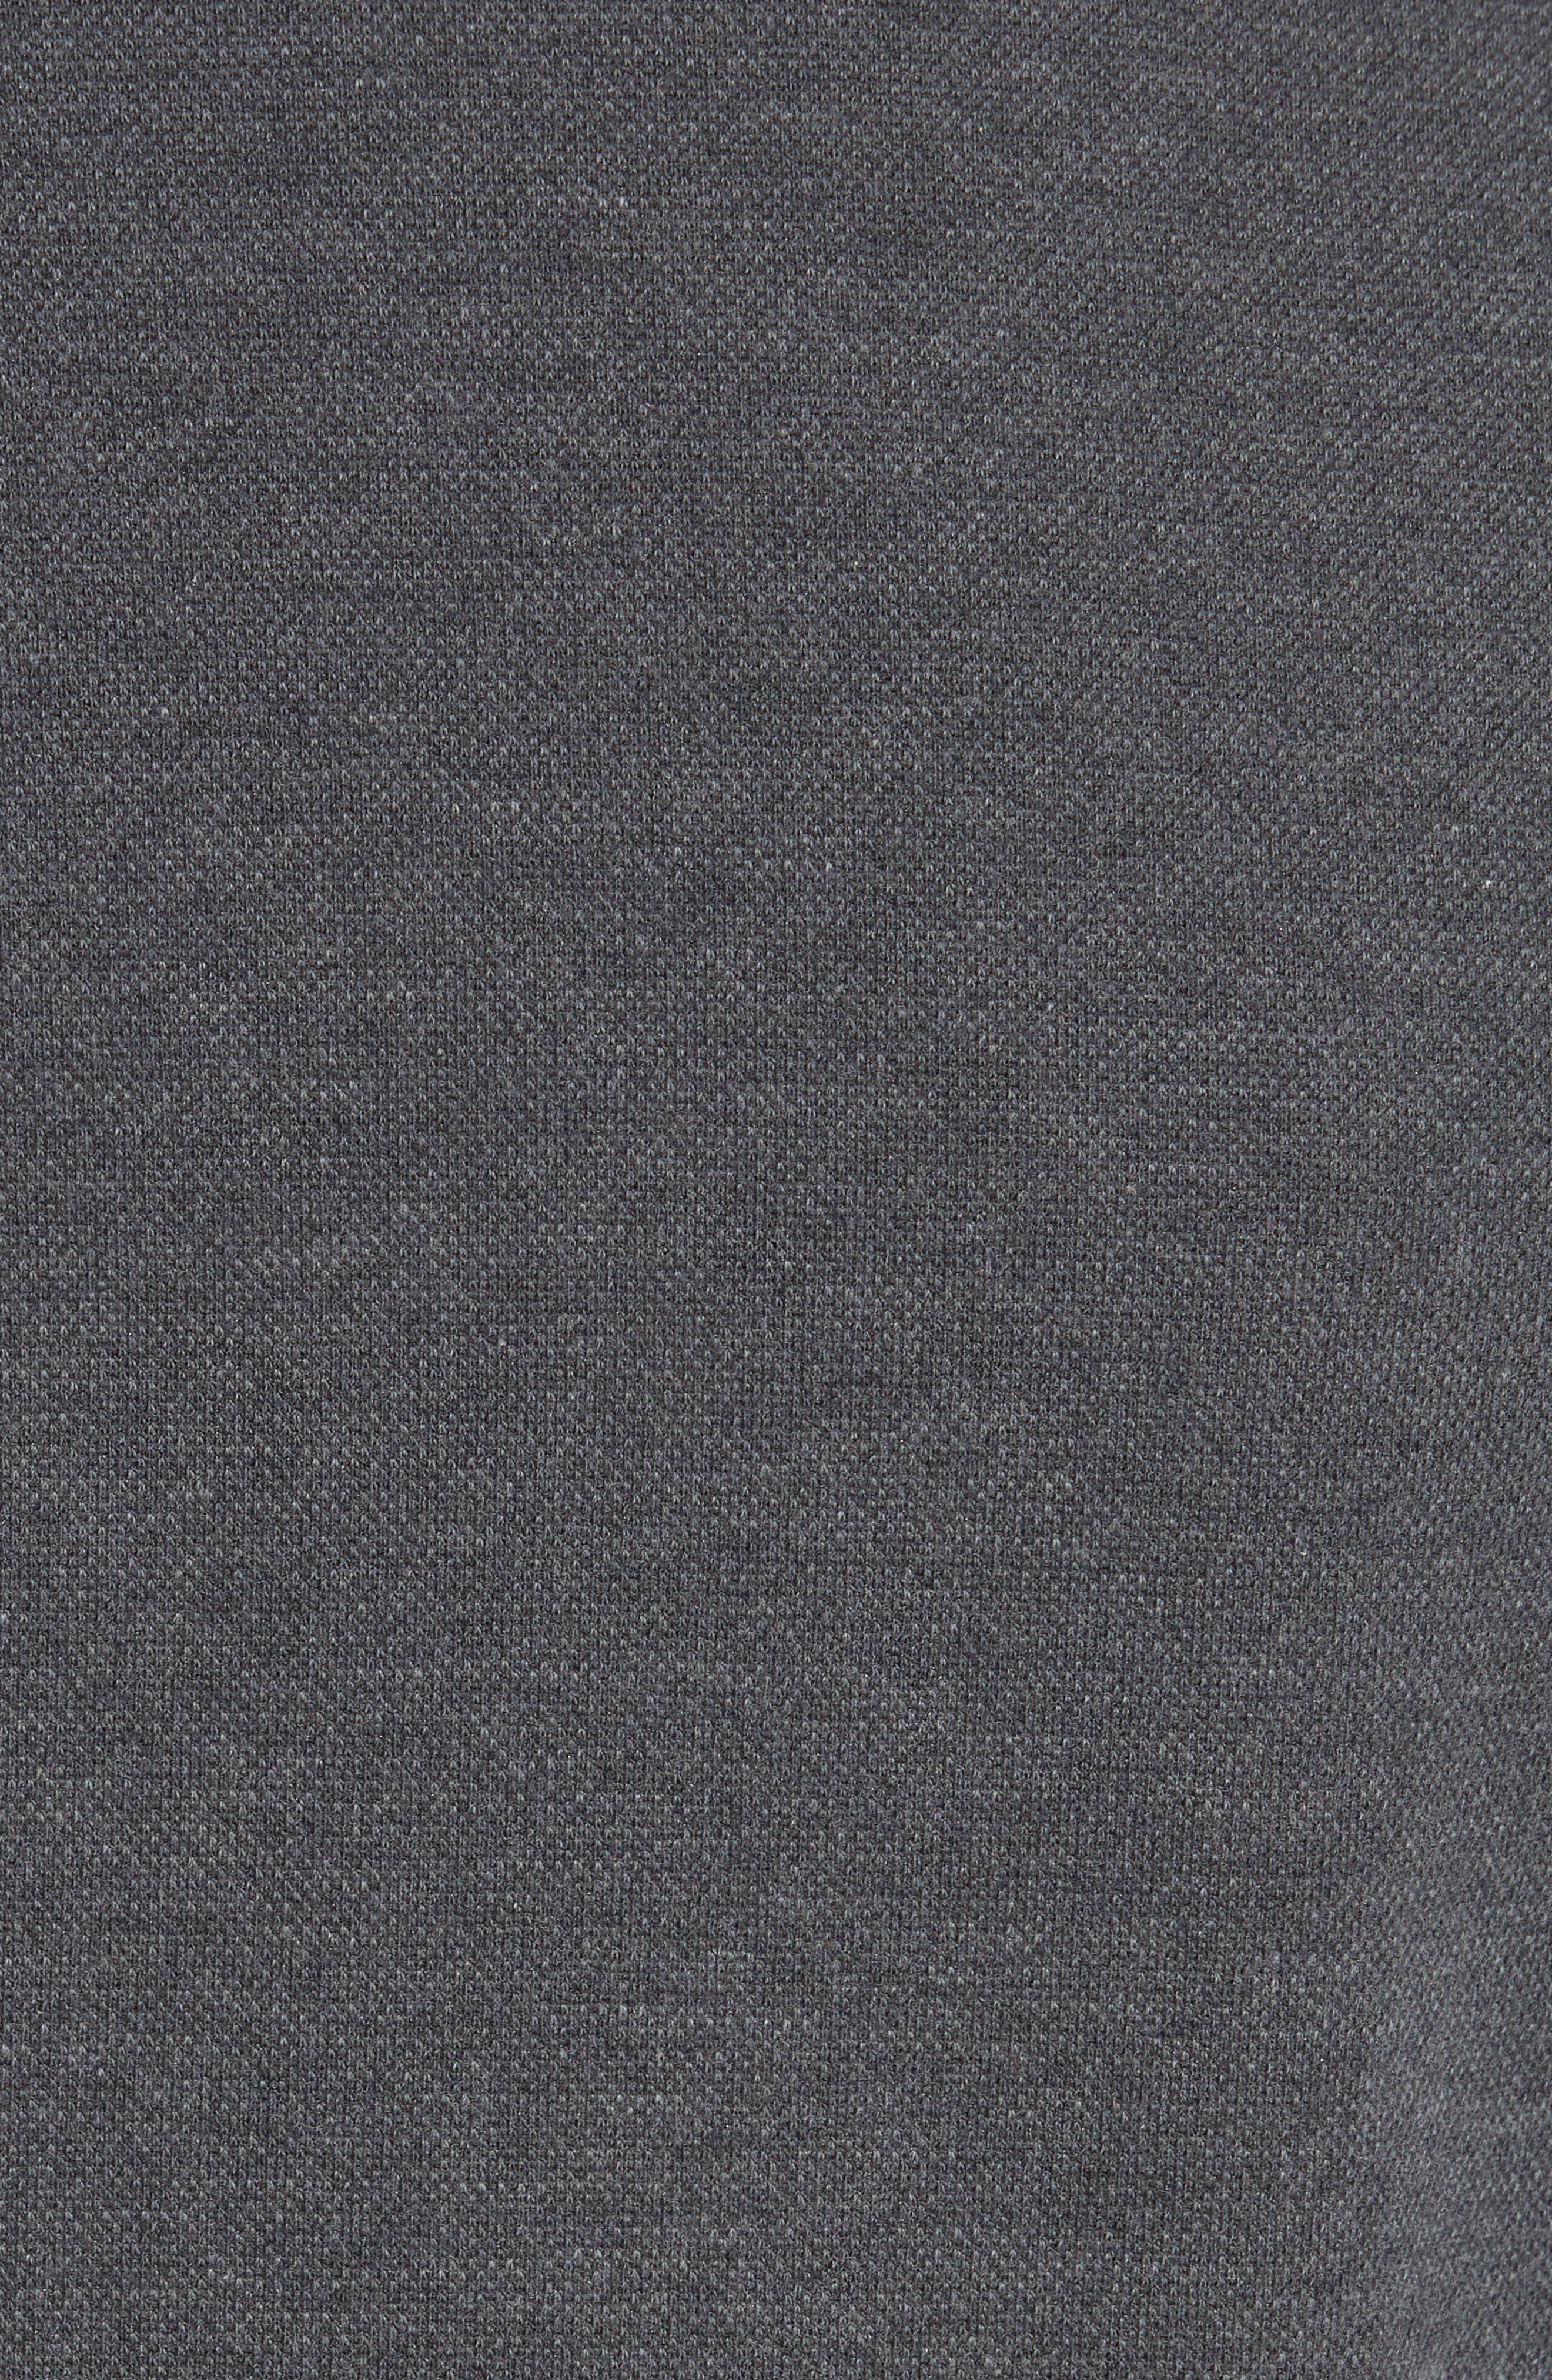 Slim Fit Stretch Cotton Blend Blazer,                             Alternate thumbnail 6, color,                             MED GREY